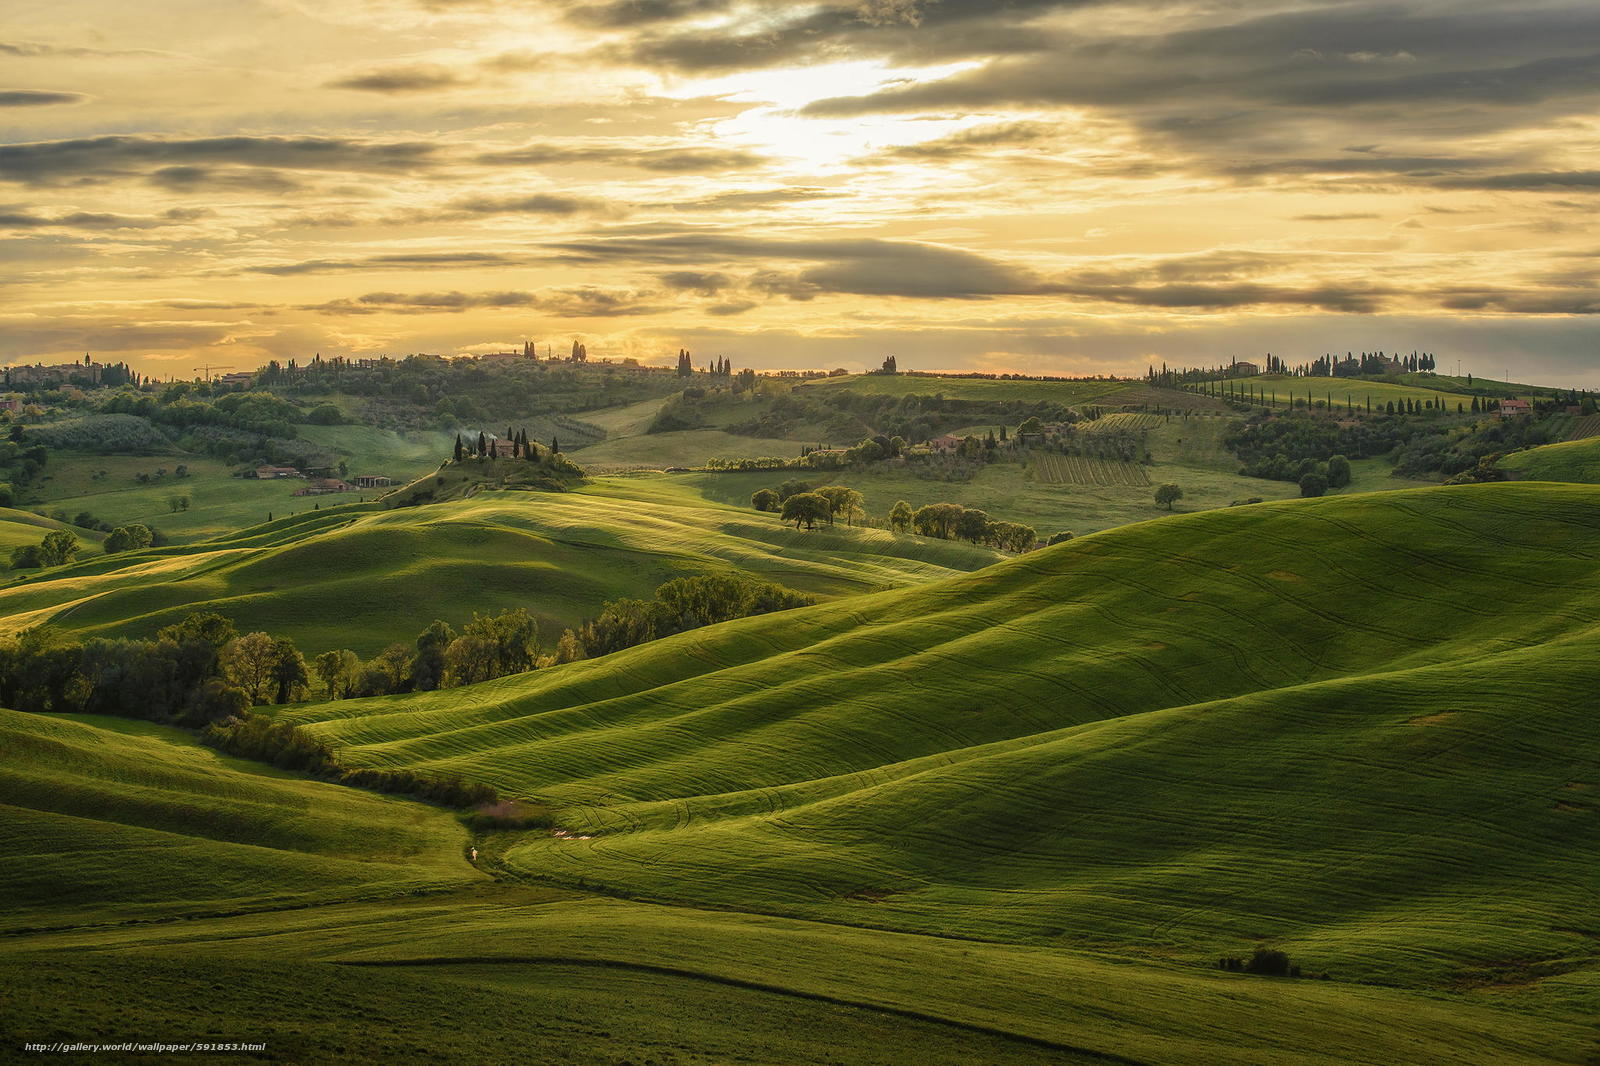 Toskana-Landschaft Am Sonnenuntergang Stockfoto - Bild: 41598880